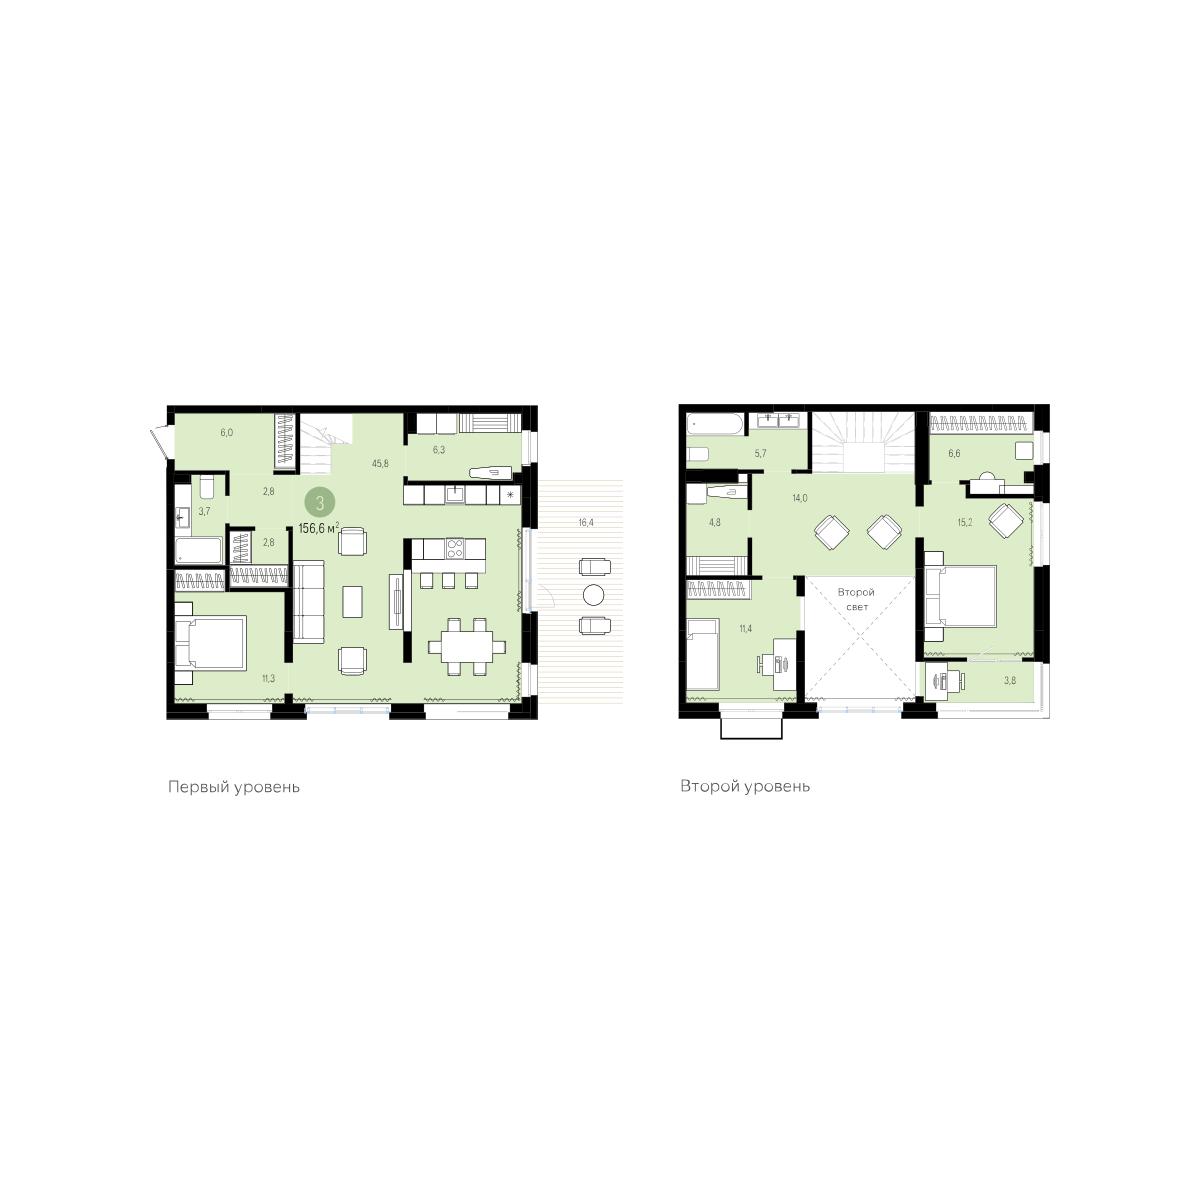 3 комнатная квартира  от застройщика,  в Европейском мкрн., ул. Газовиков, ЖК «Европейский квартал», Тюмень